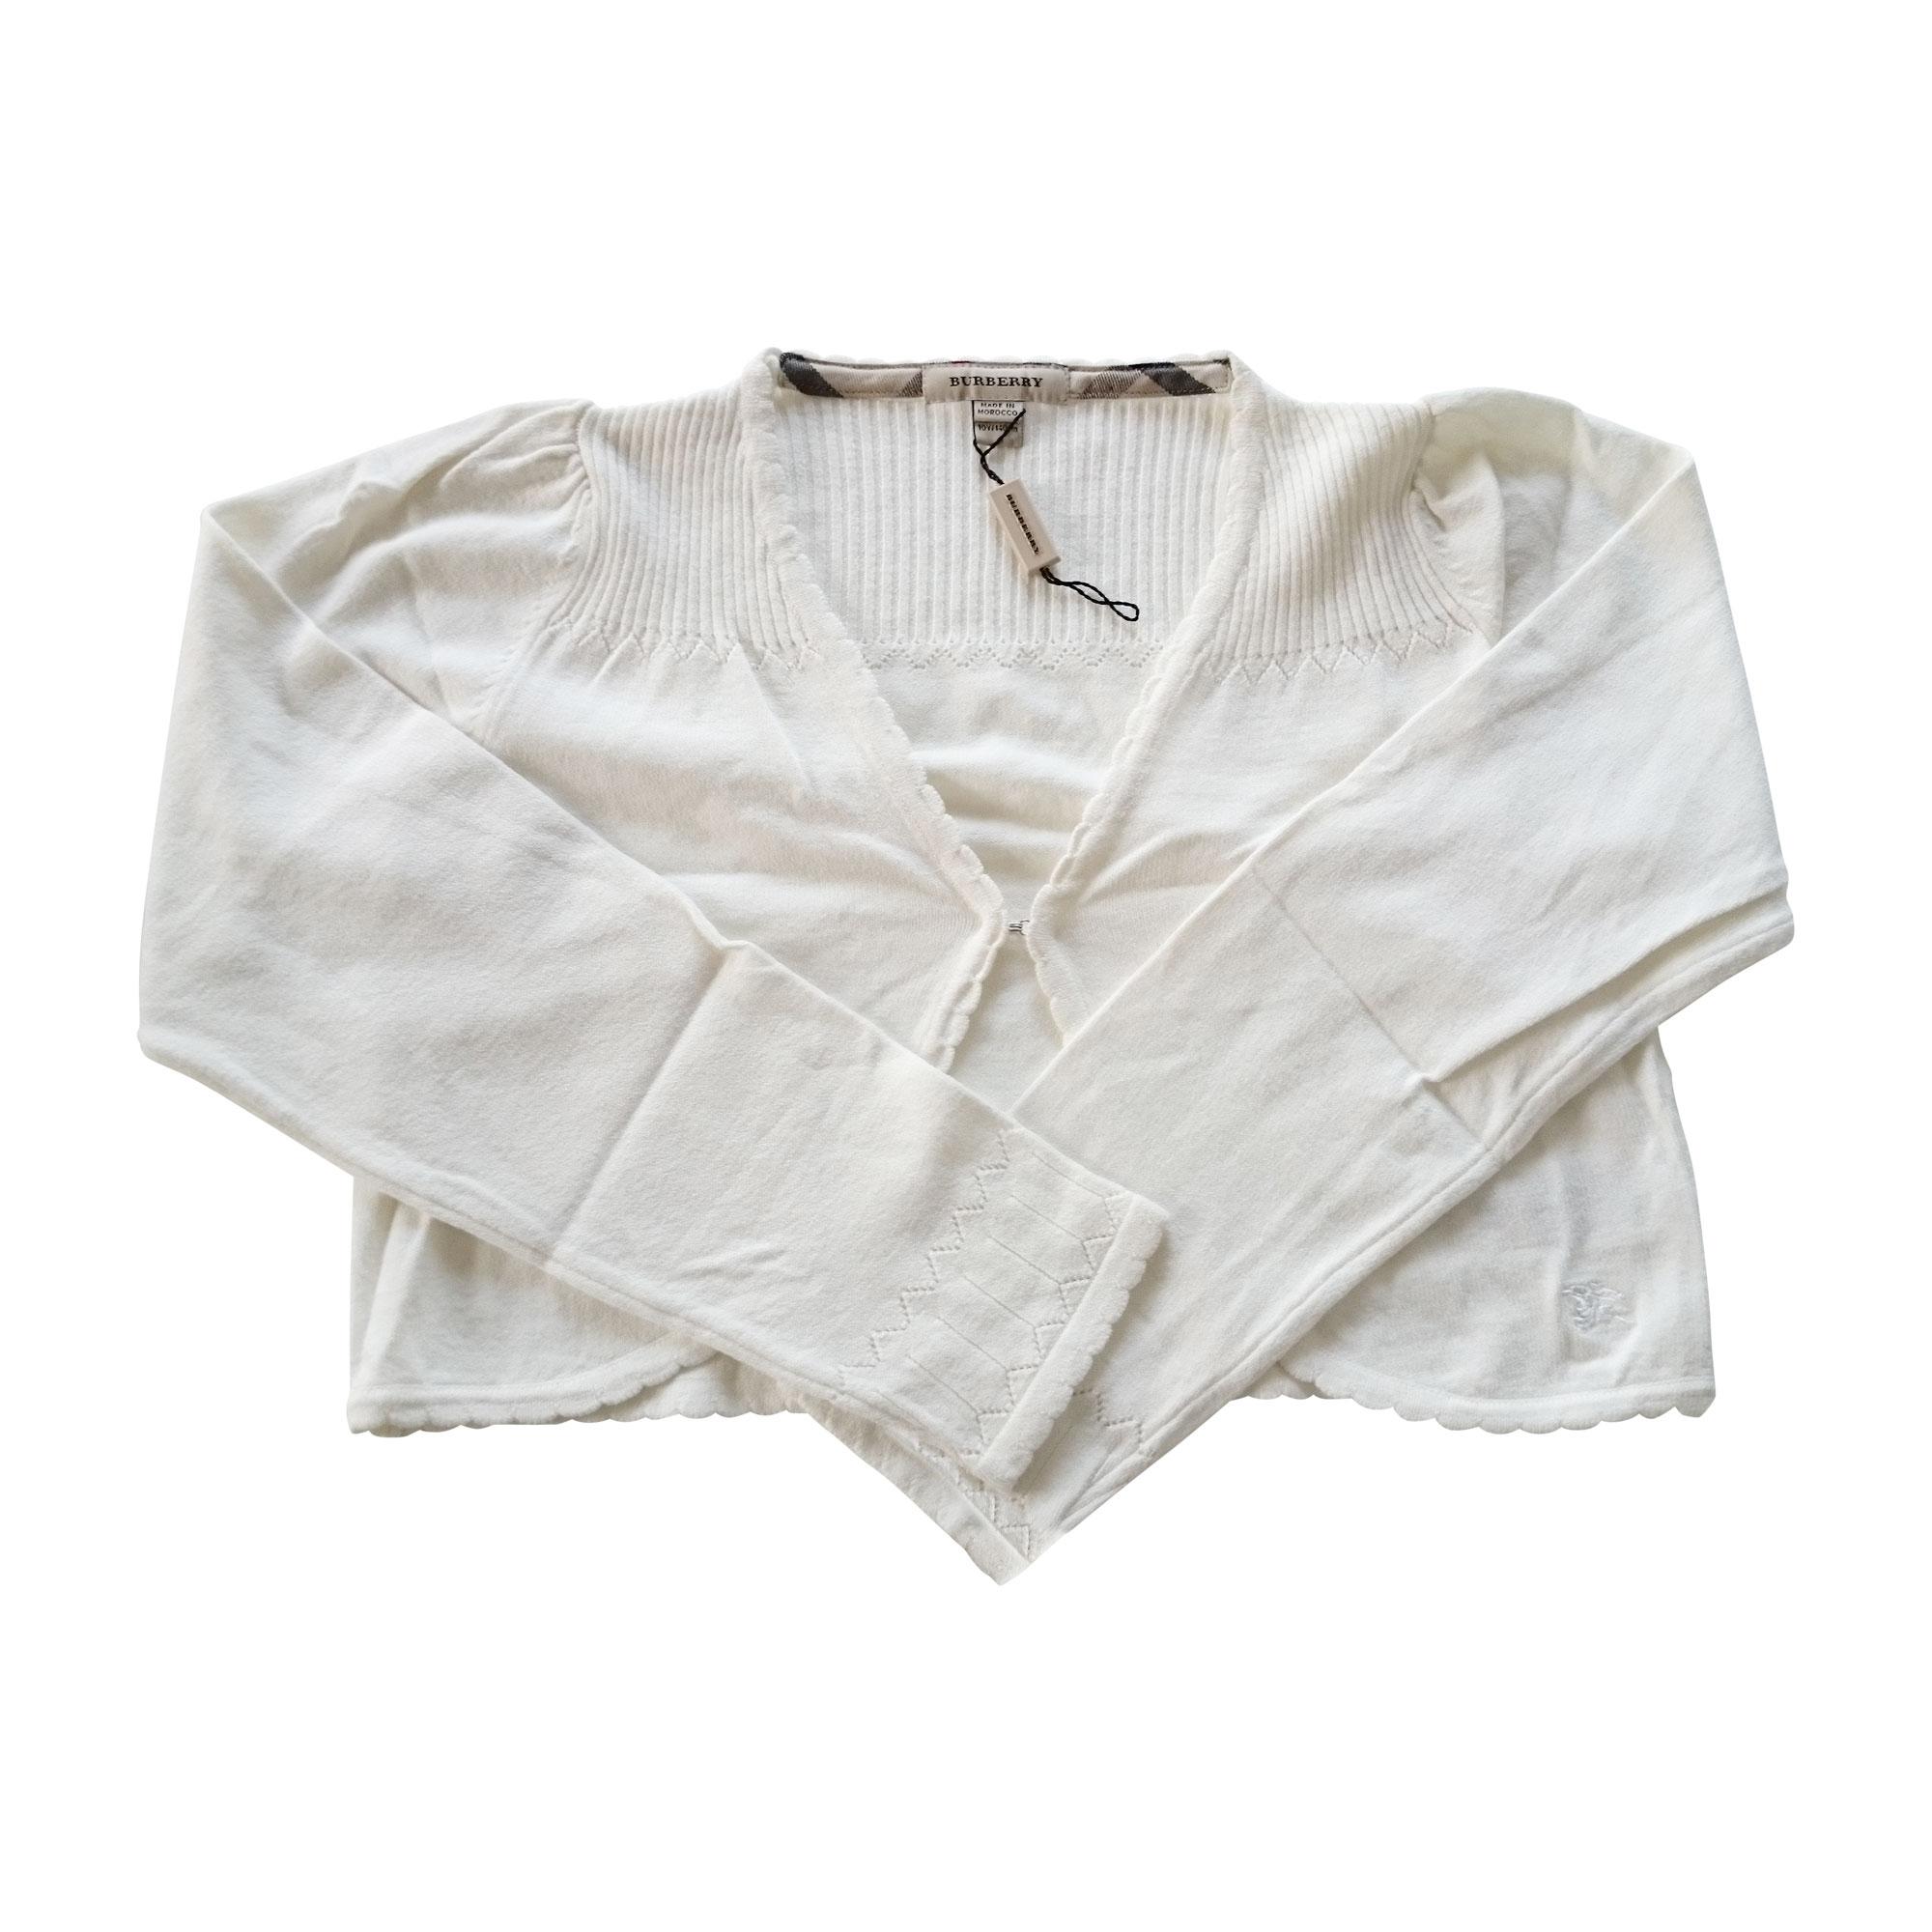 Gilet, cardigan BURBERRY Blanc, blanc cassé, écru